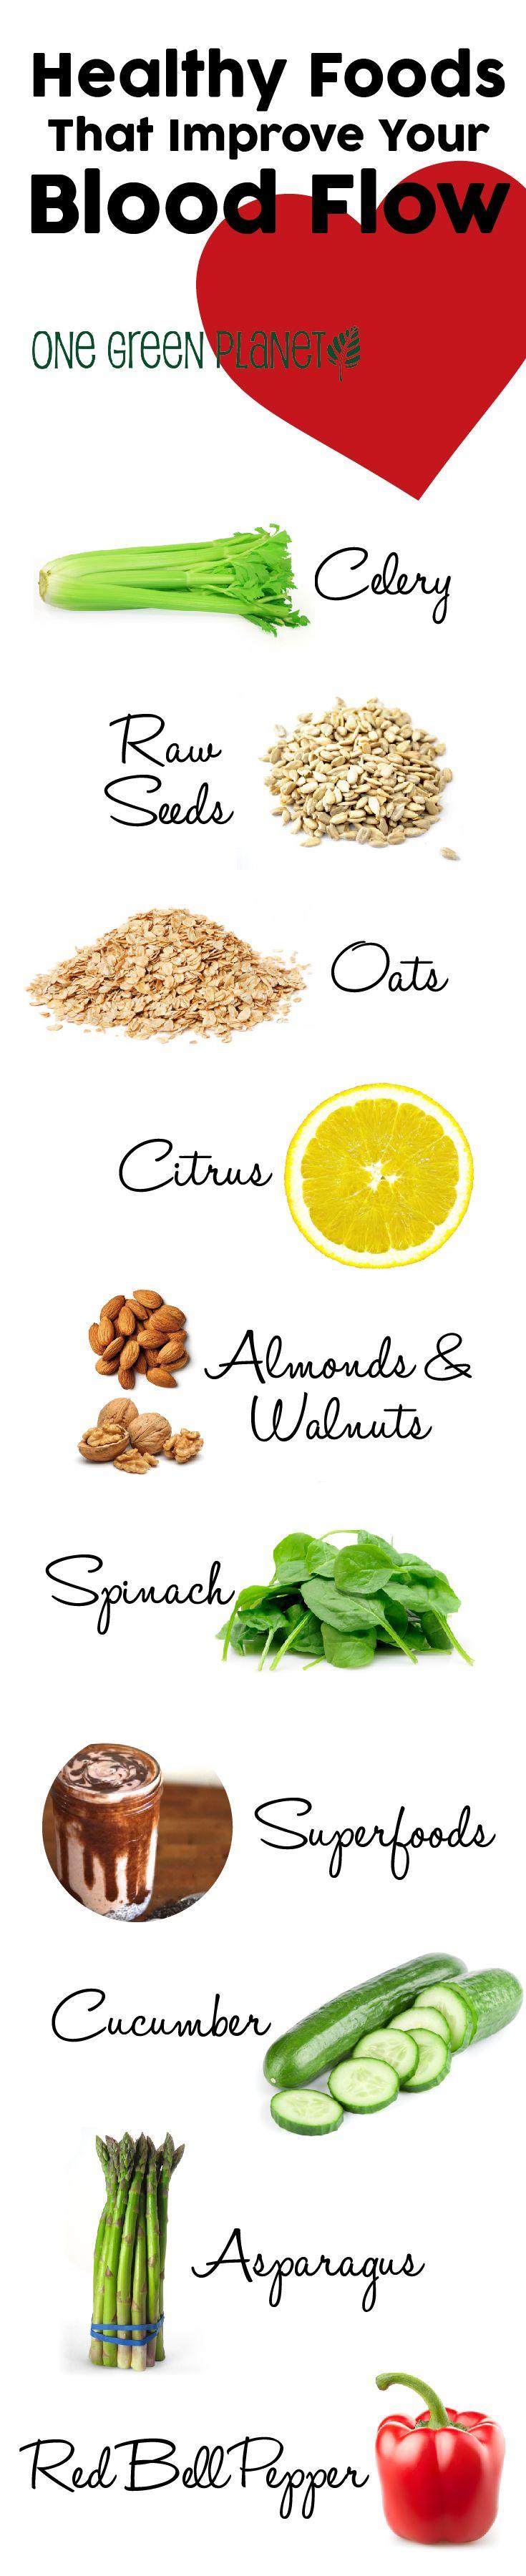 132 best heart healthy recipes images on pinterest health foods foods for improving blood flow forumfinder Images